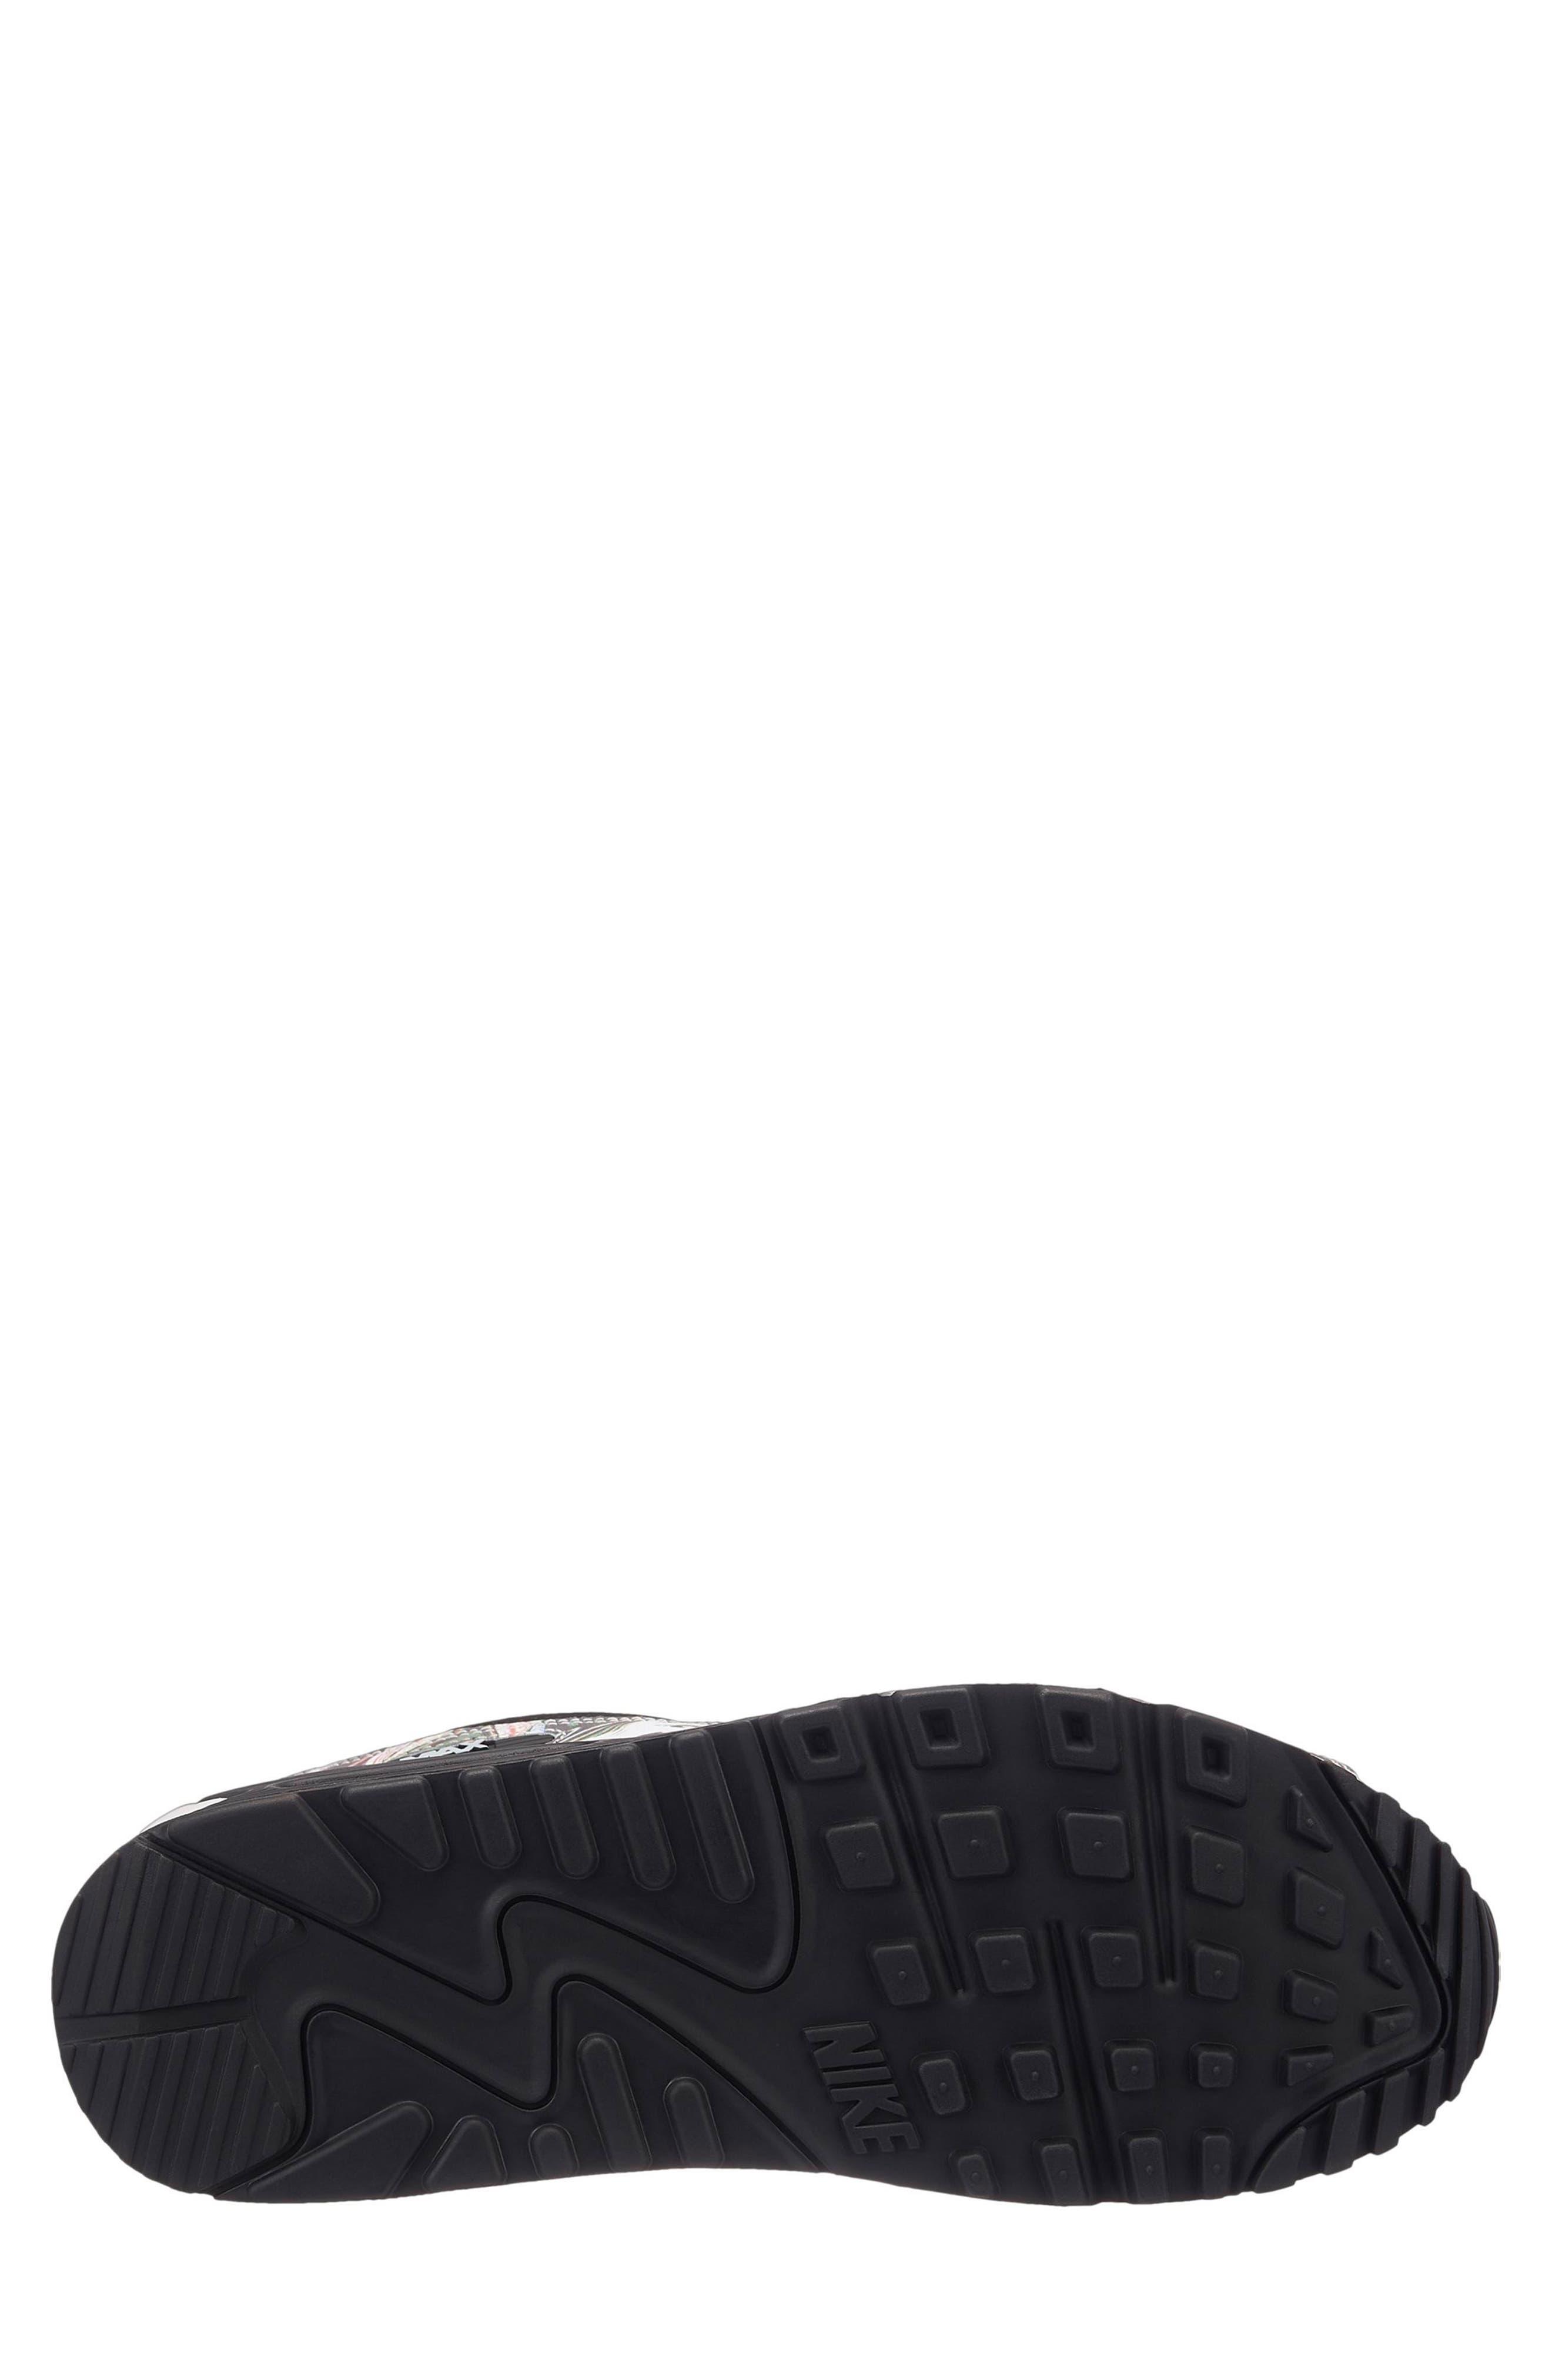 Air Max 90 Marble Sneaker,                             Alternate thumbnail 2, color,                             001